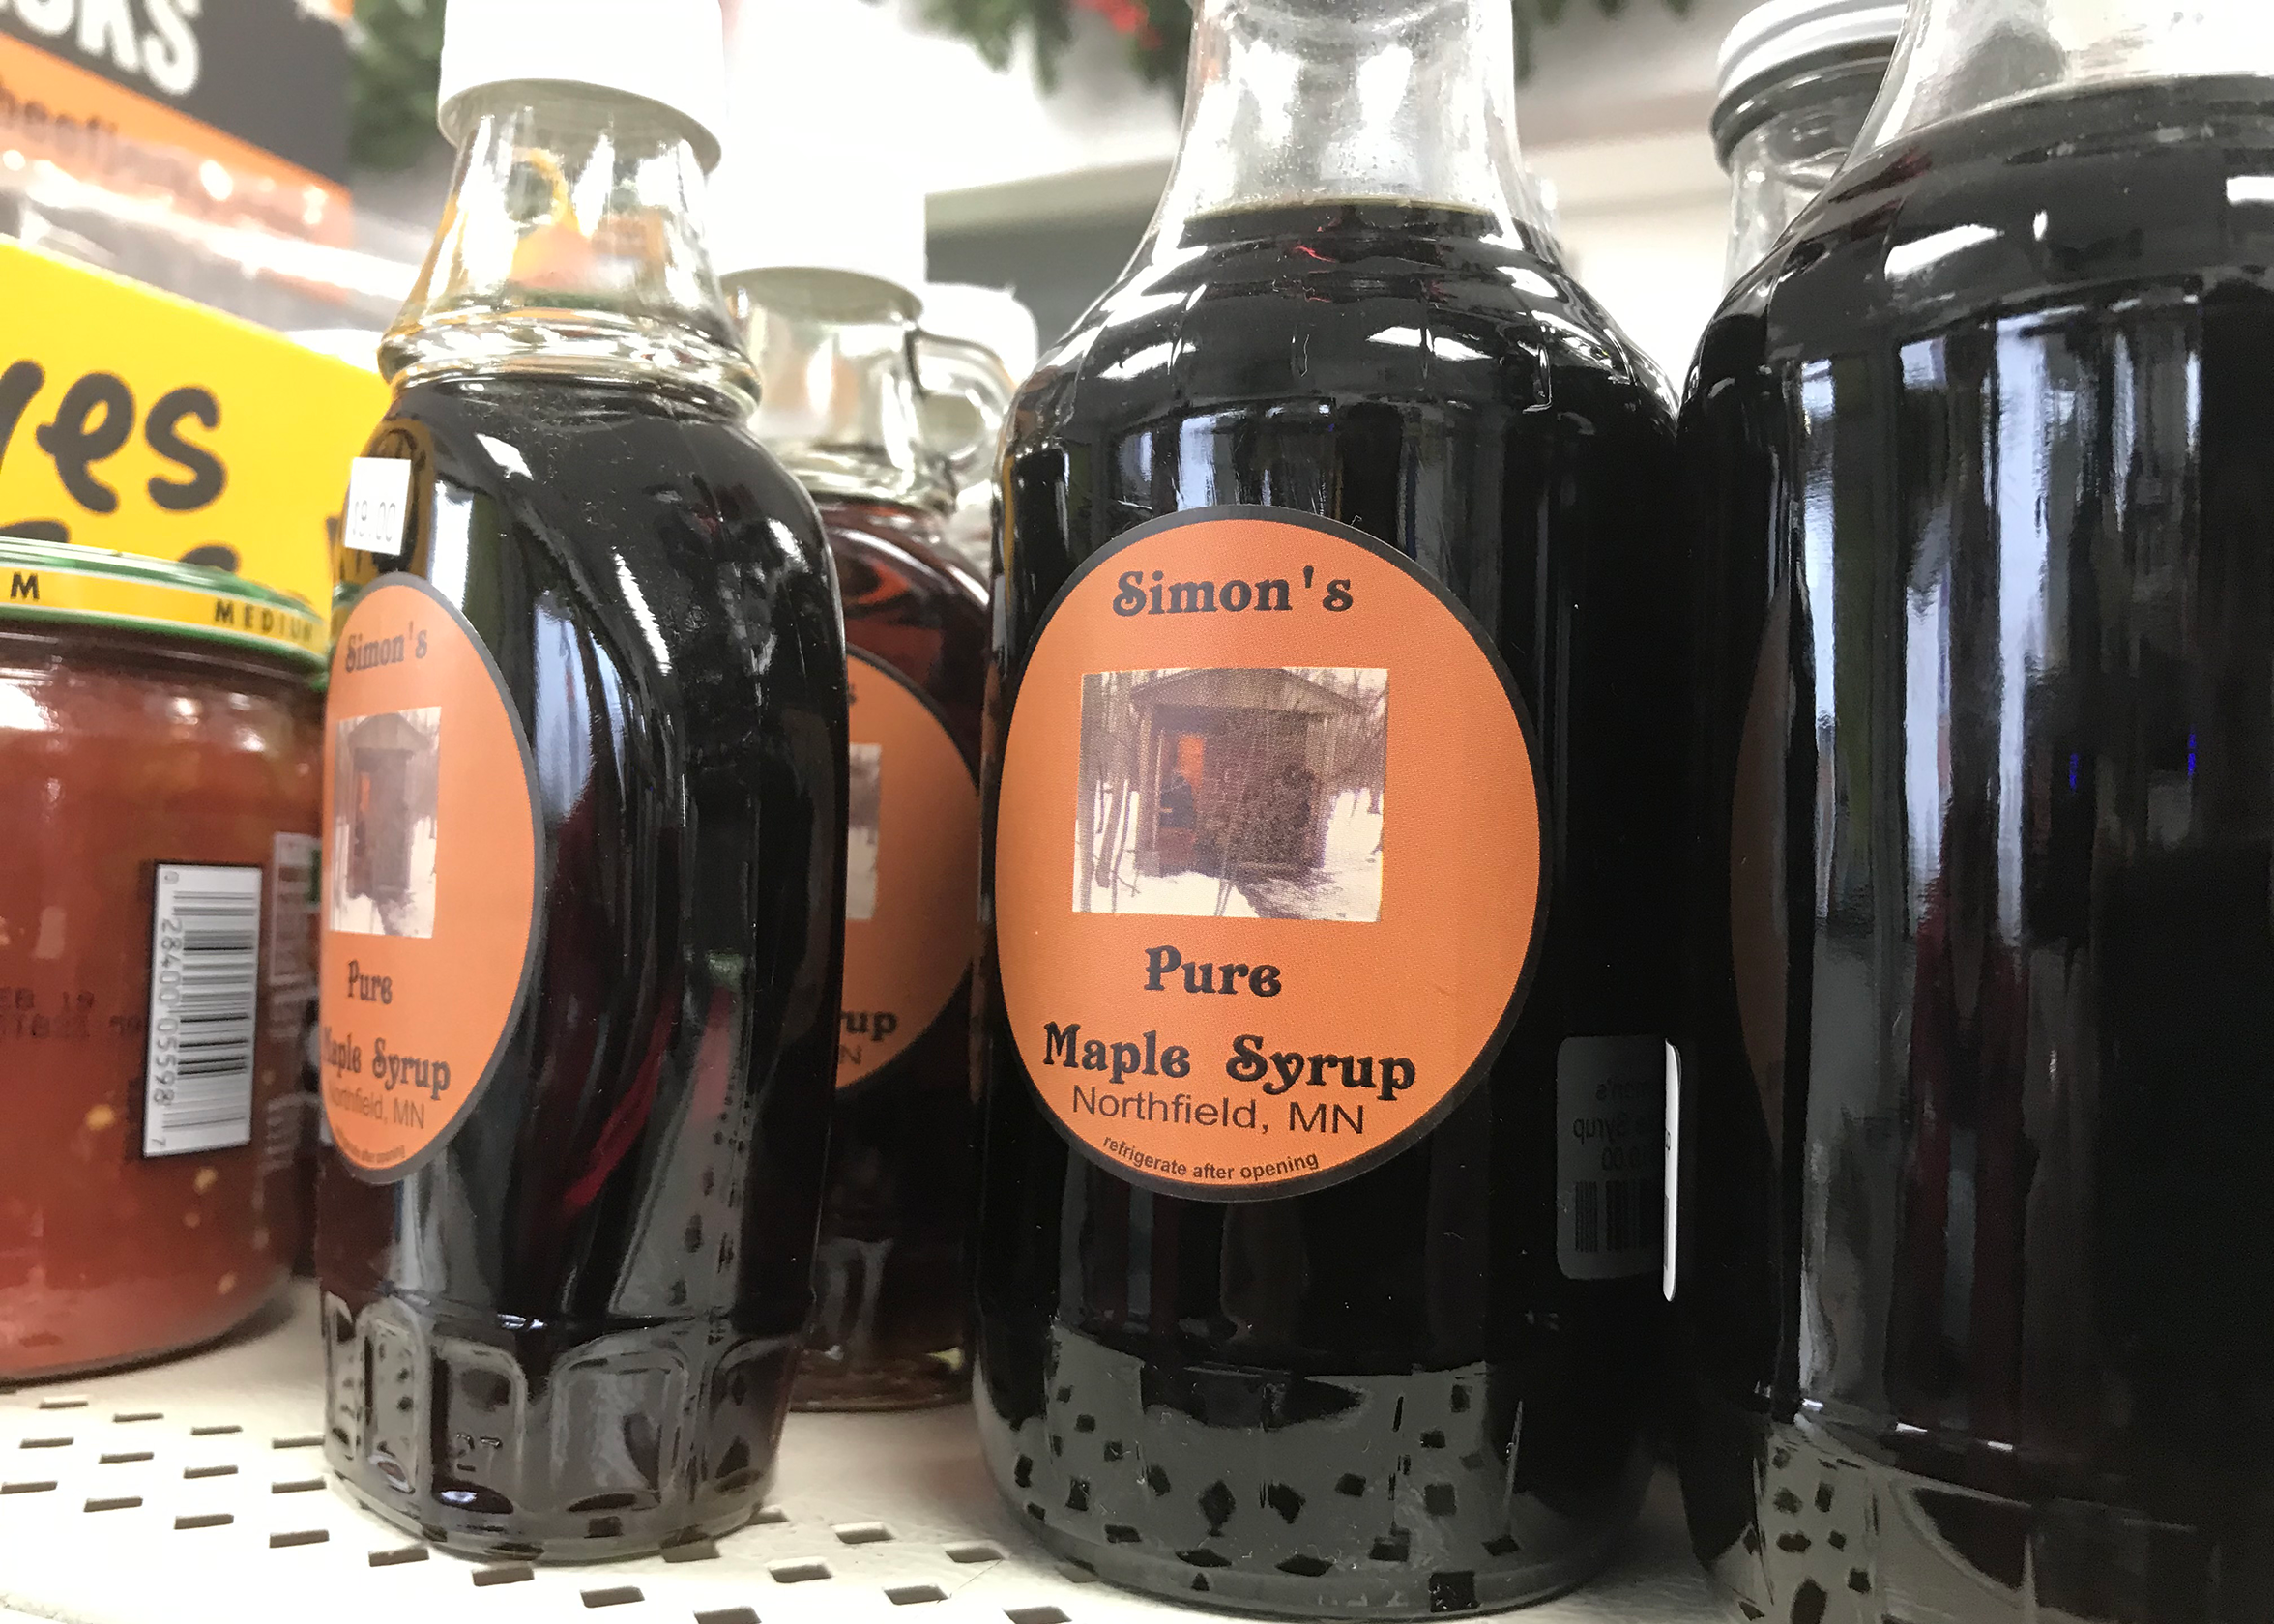 Simon's Maple Syrup